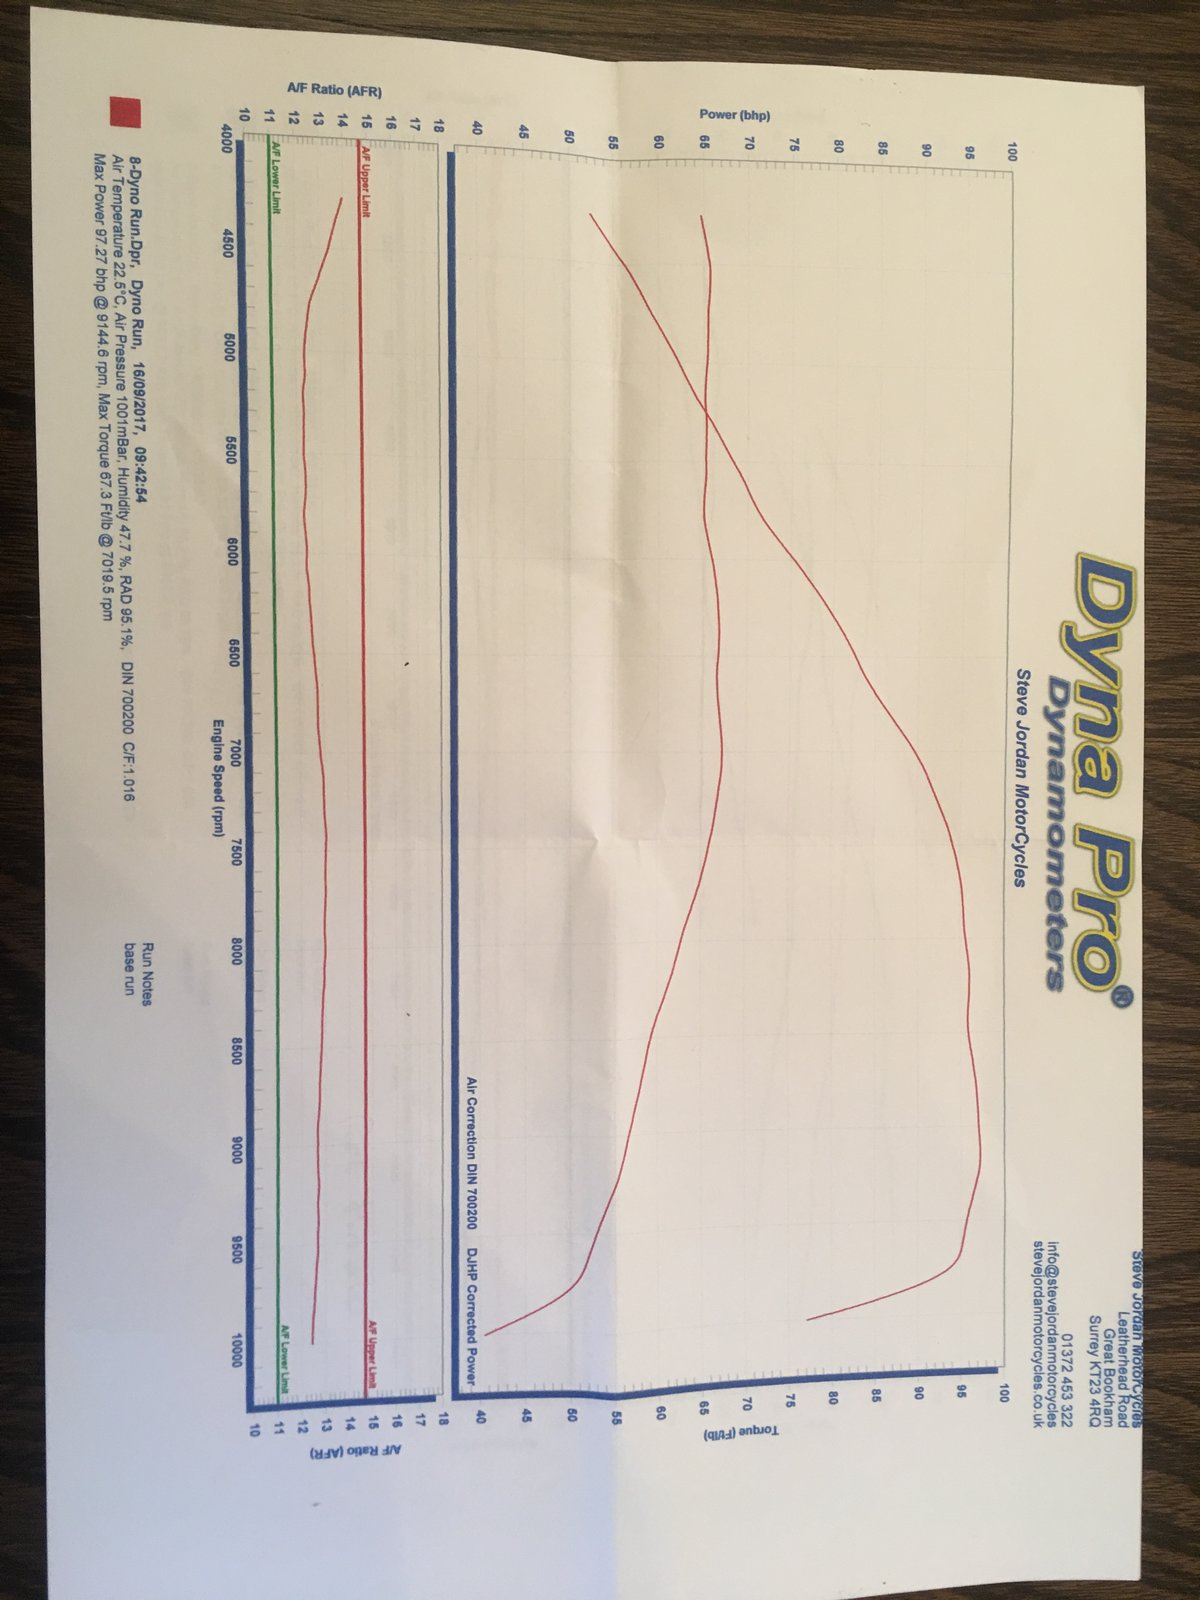 Dyno Run Ducati SuperSport S 1.JPG